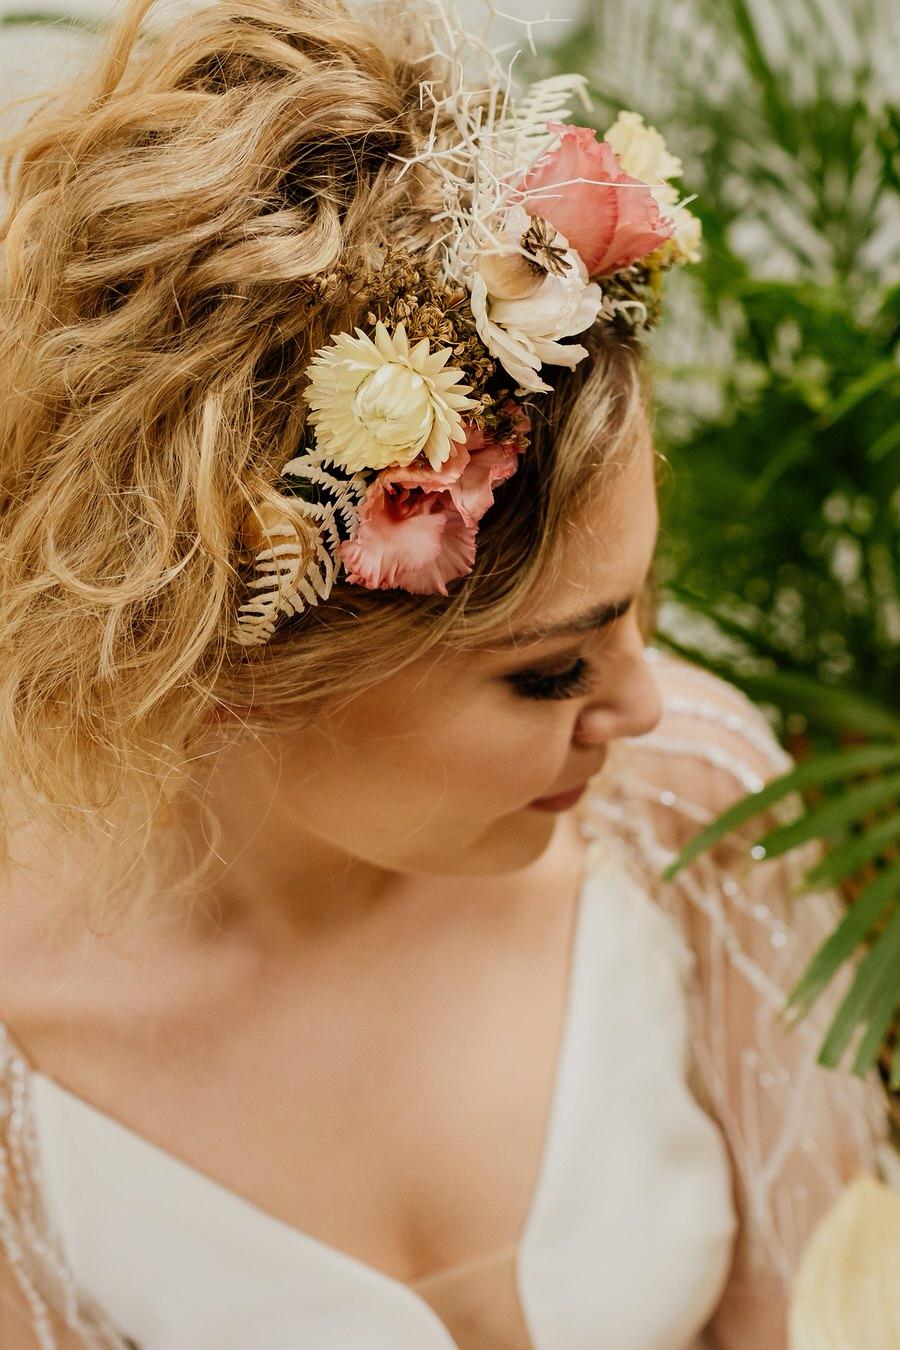 Free spirited modern jungle wedding inspiration at White Syke Fields, image credit Jenna Kathleen Photography (14)